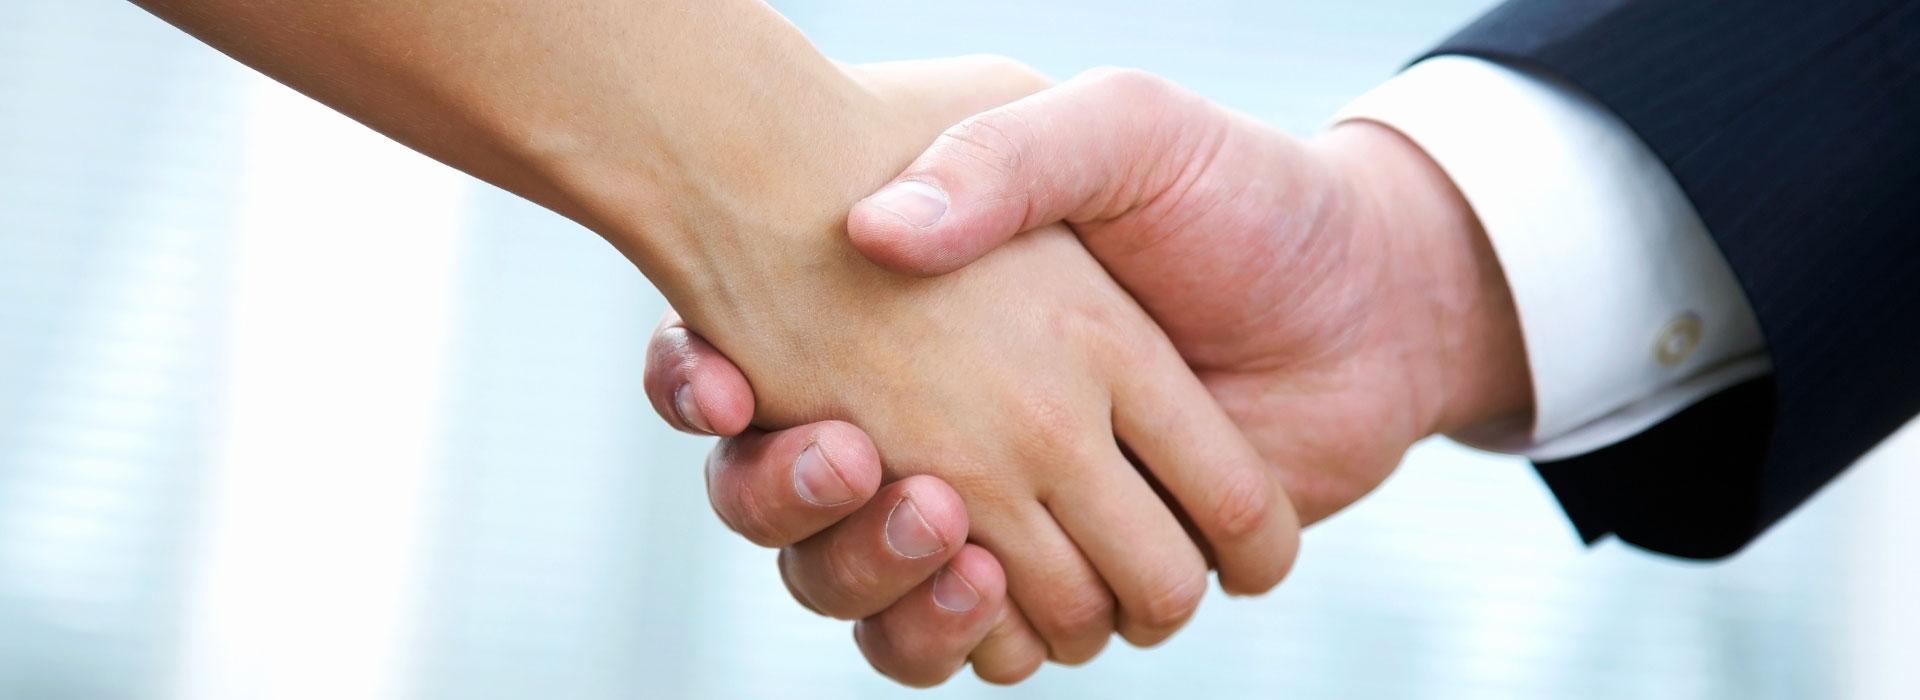 man_woman_handshake.jpg